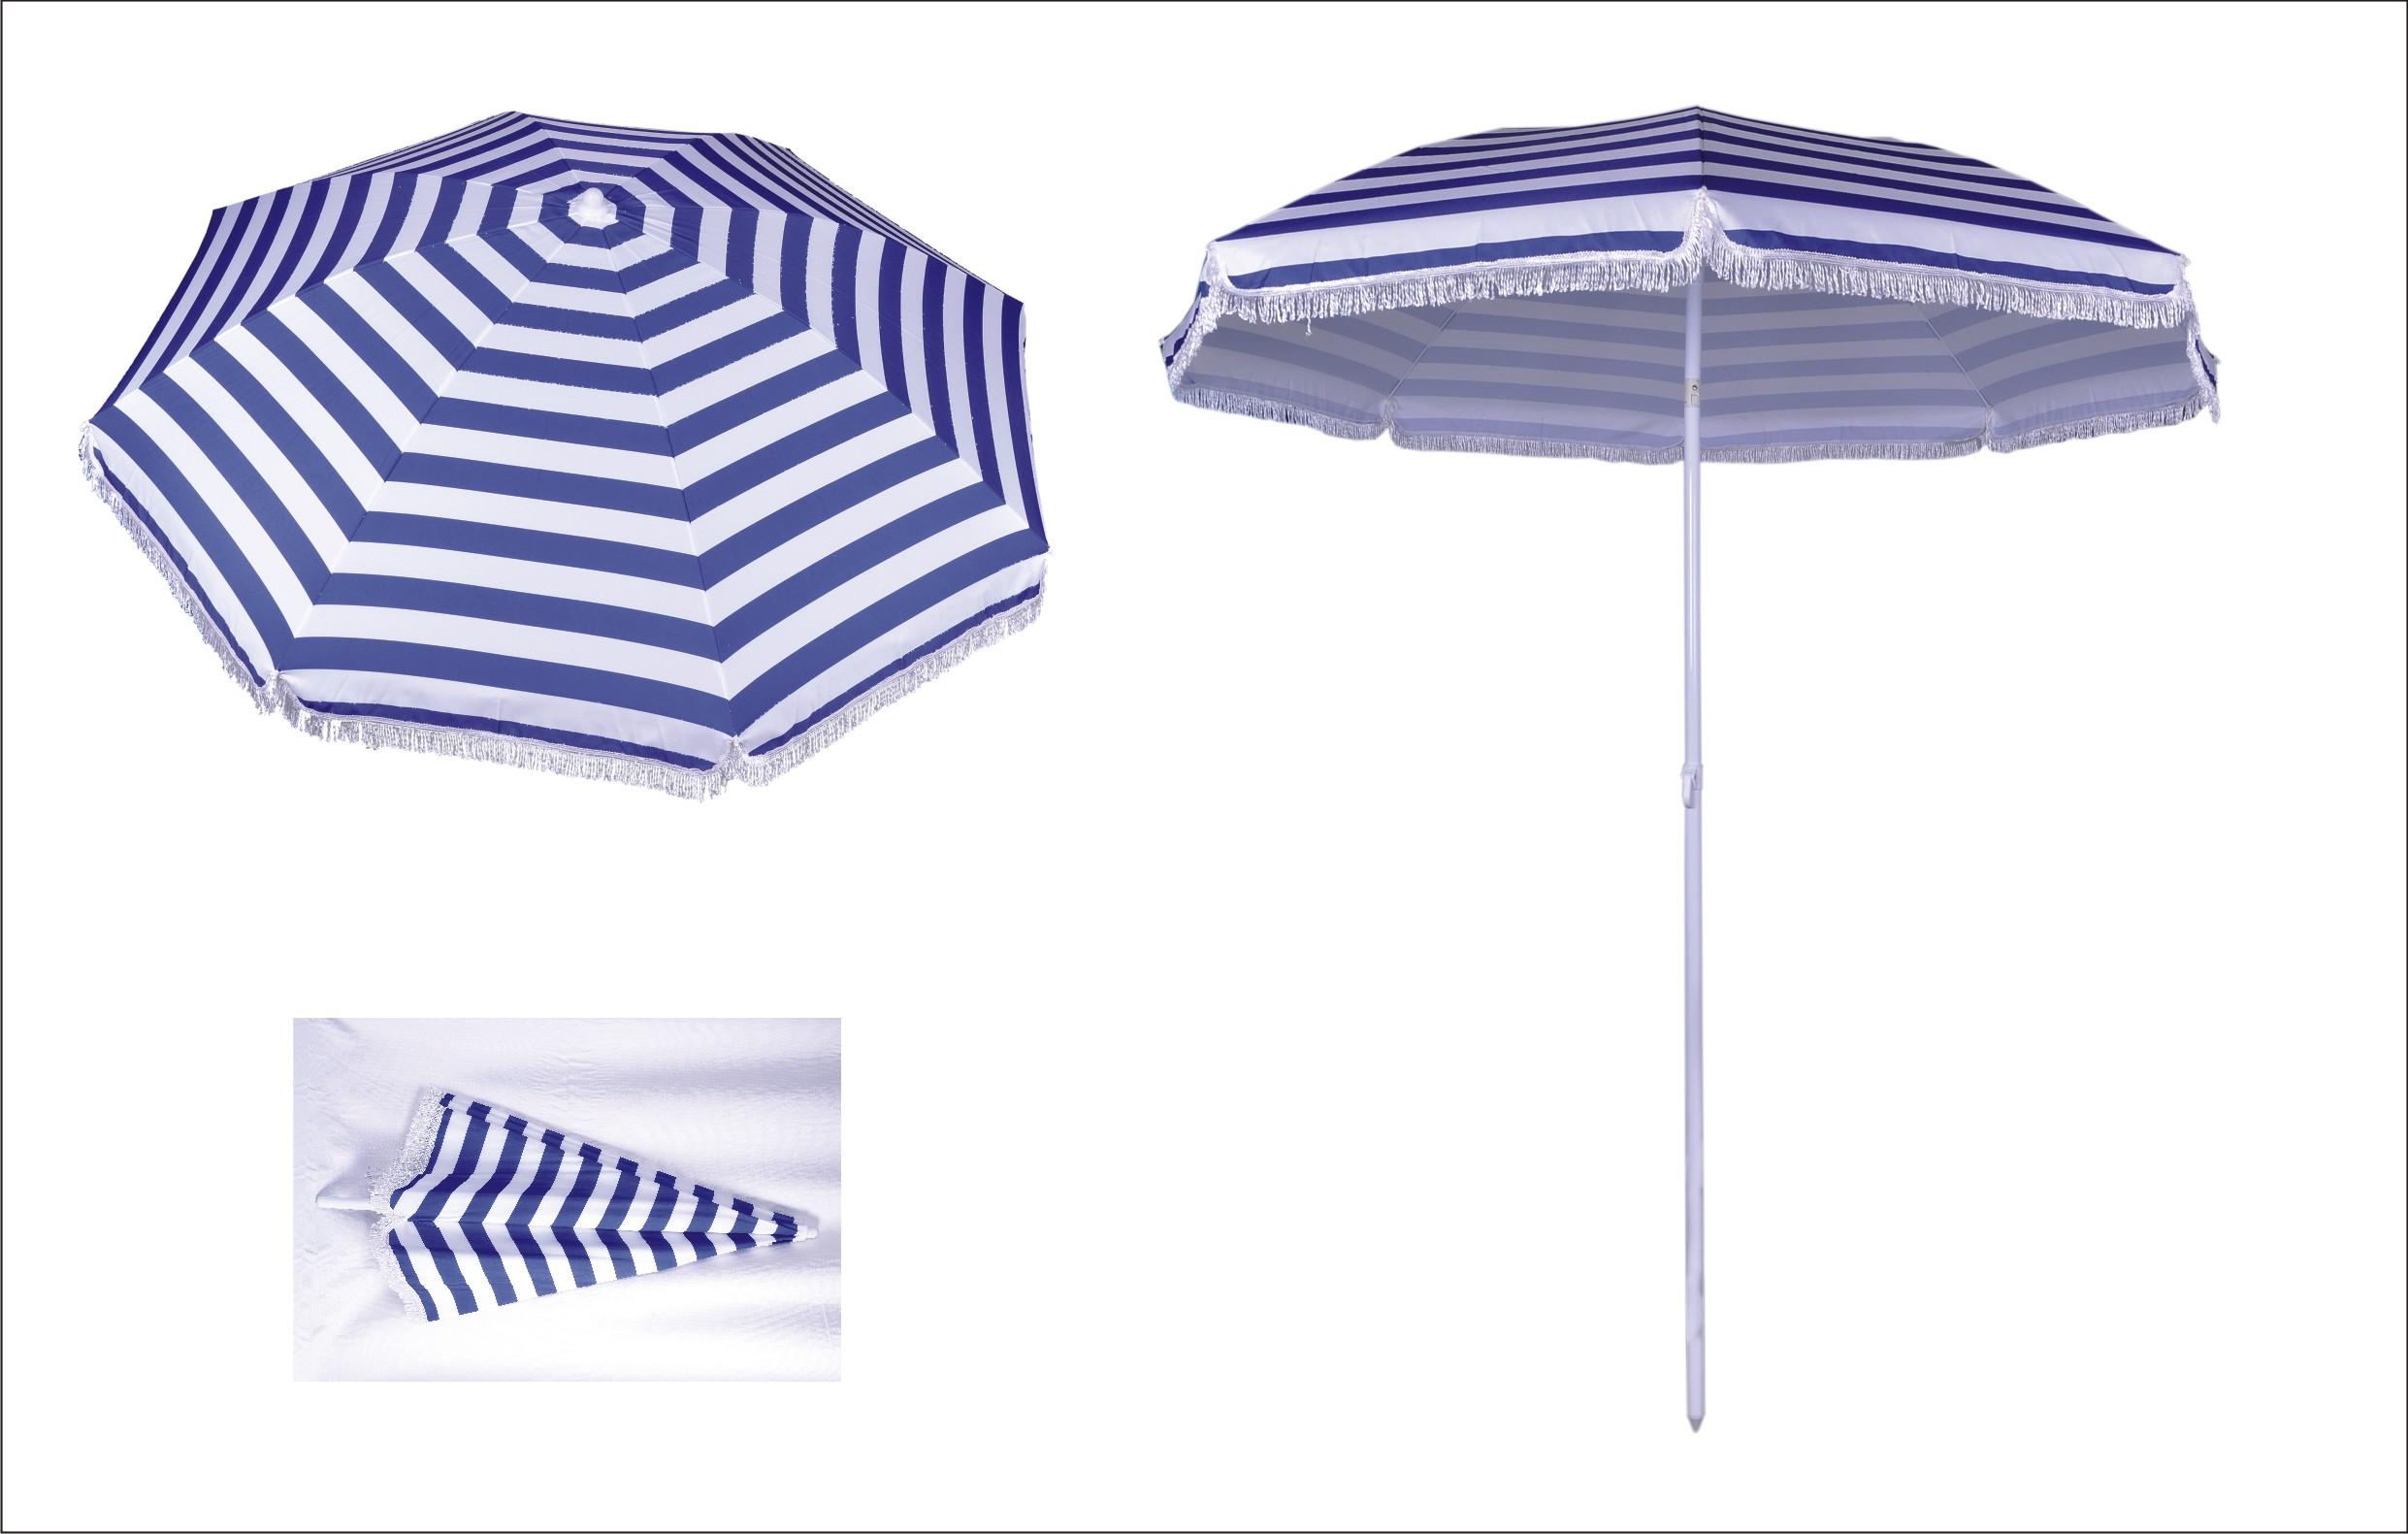 Surveyor umbrella